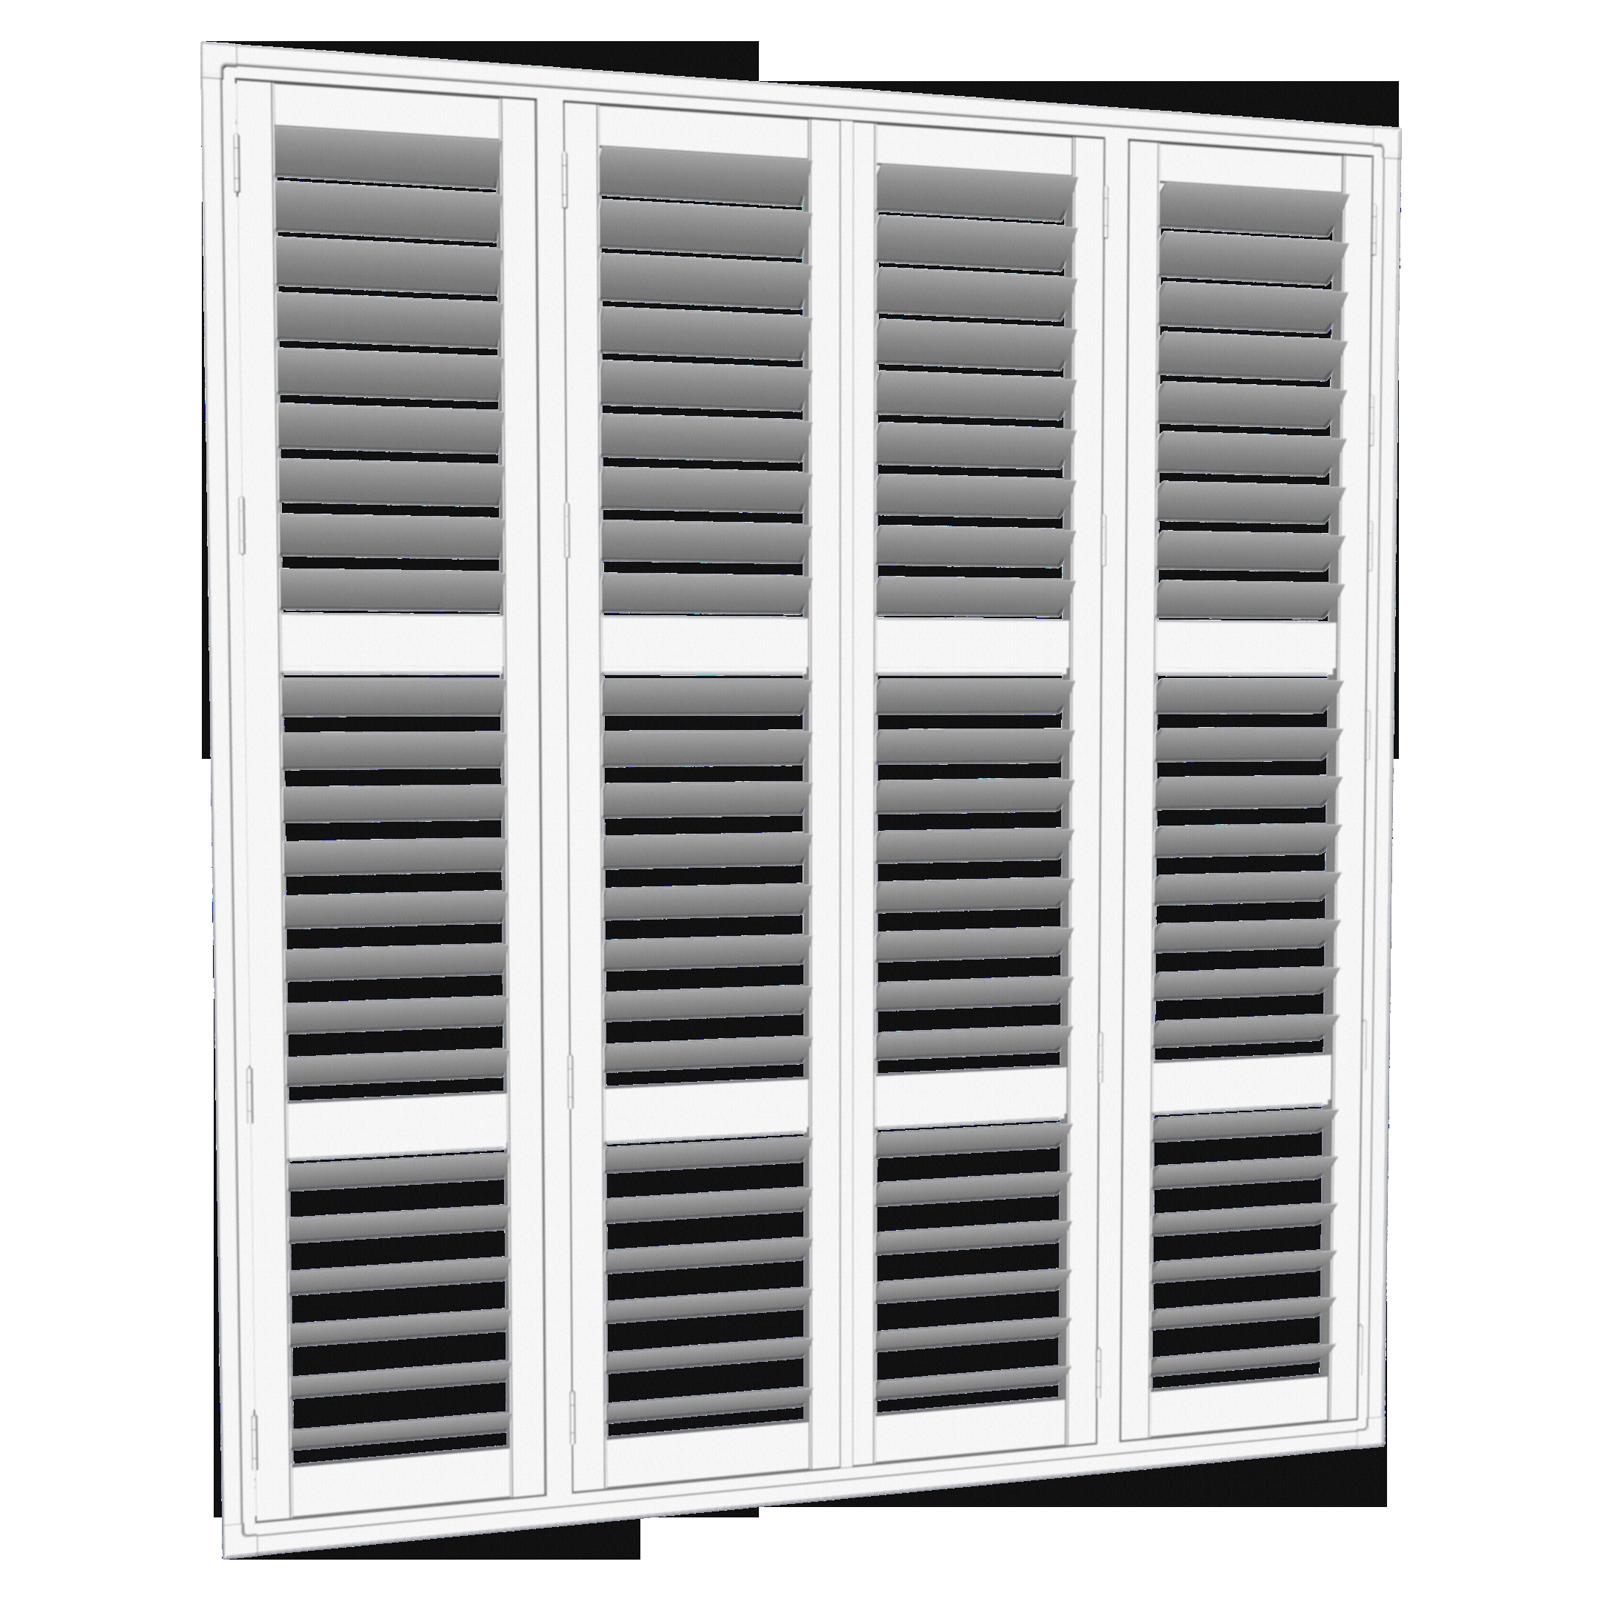 EasyAS 3500 x 2850mm White Adjustable Custom Plantation Shutters